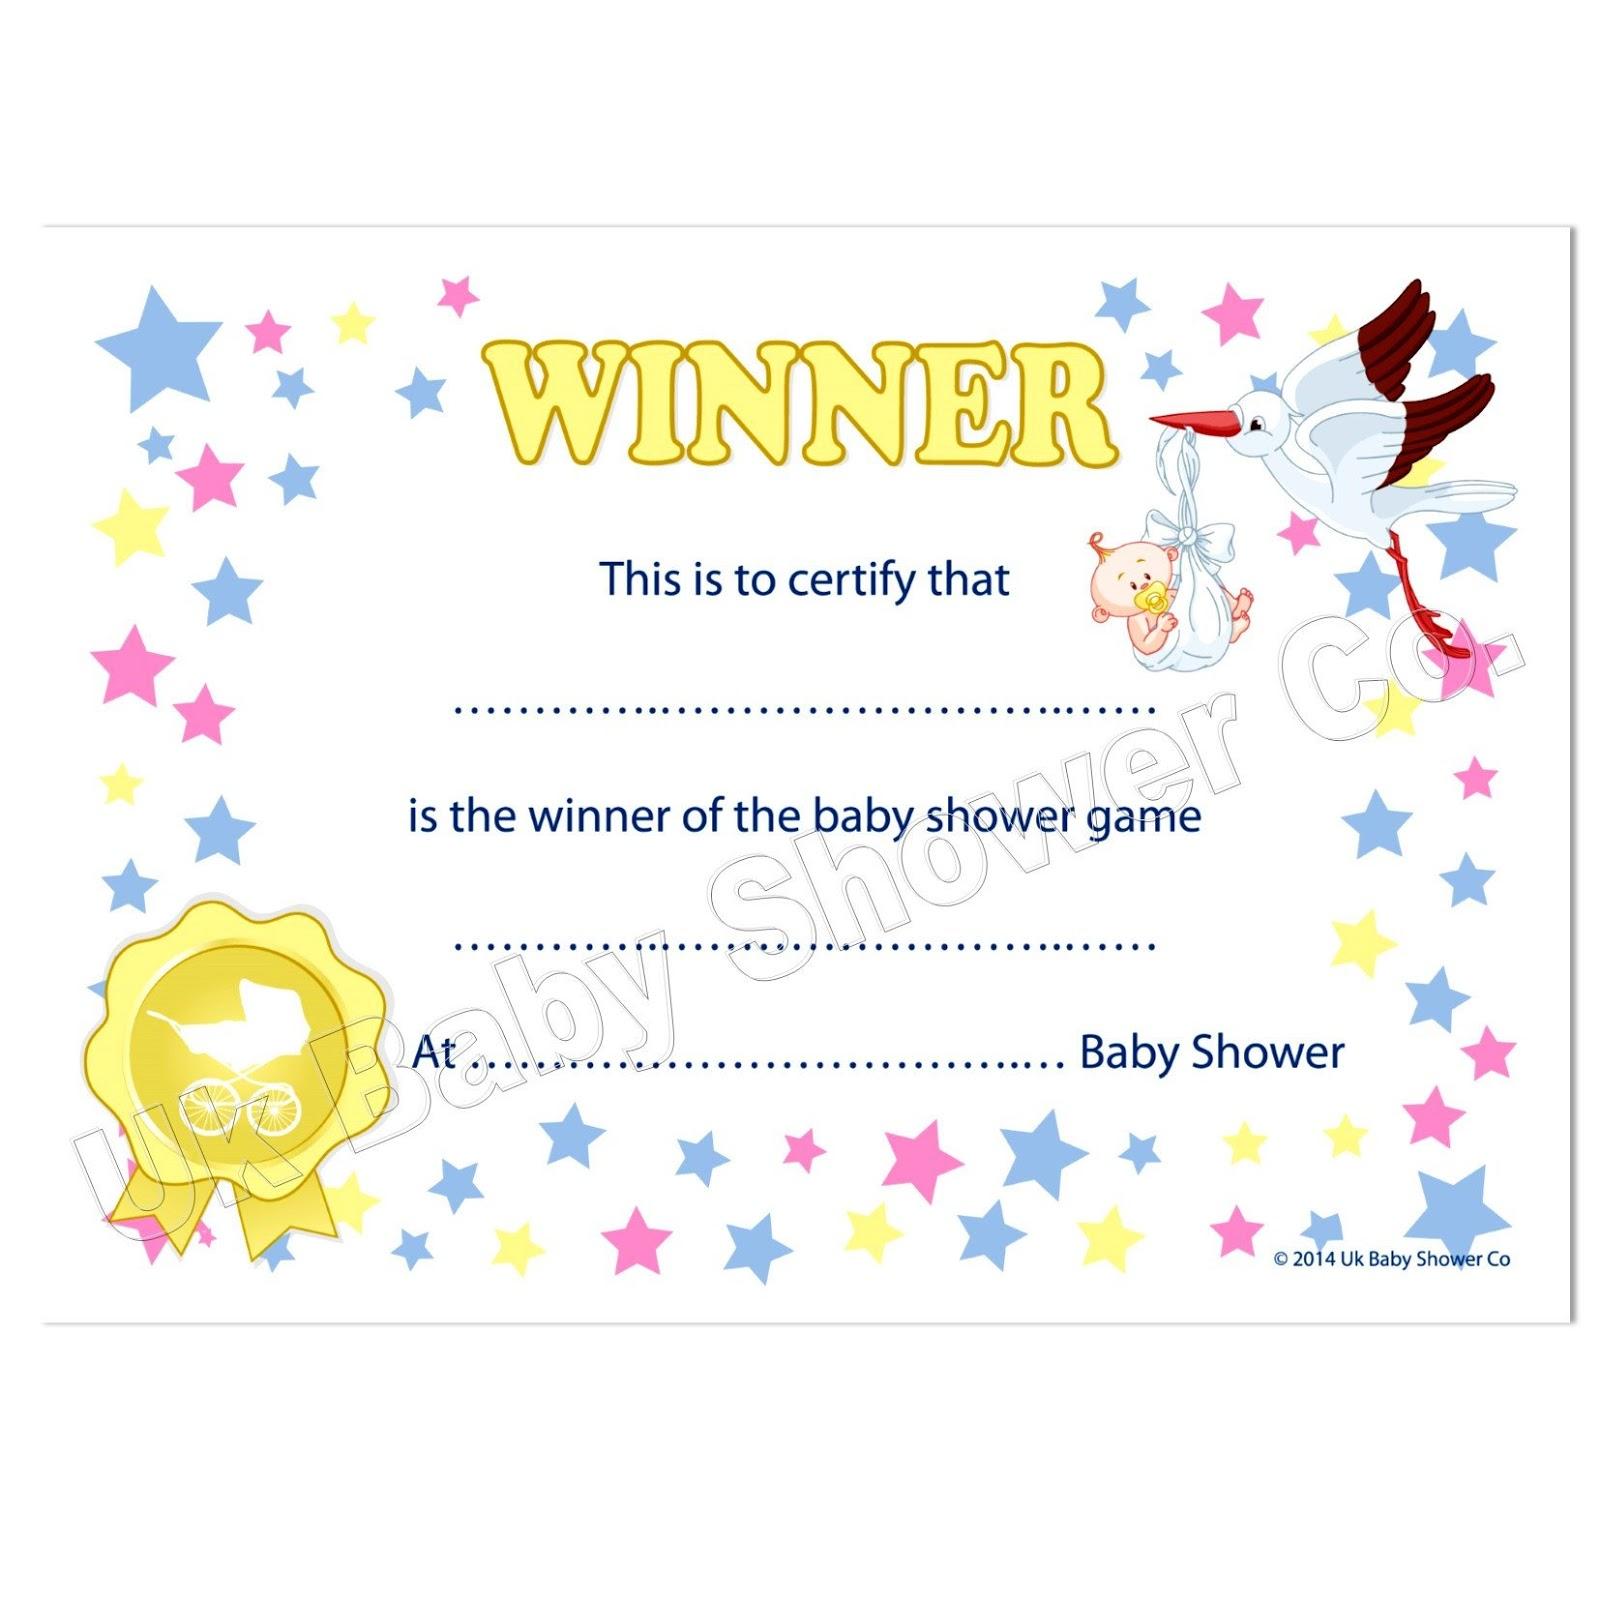 Contest winner certificate template apa templates contest winner certificate template alramifo Gallery